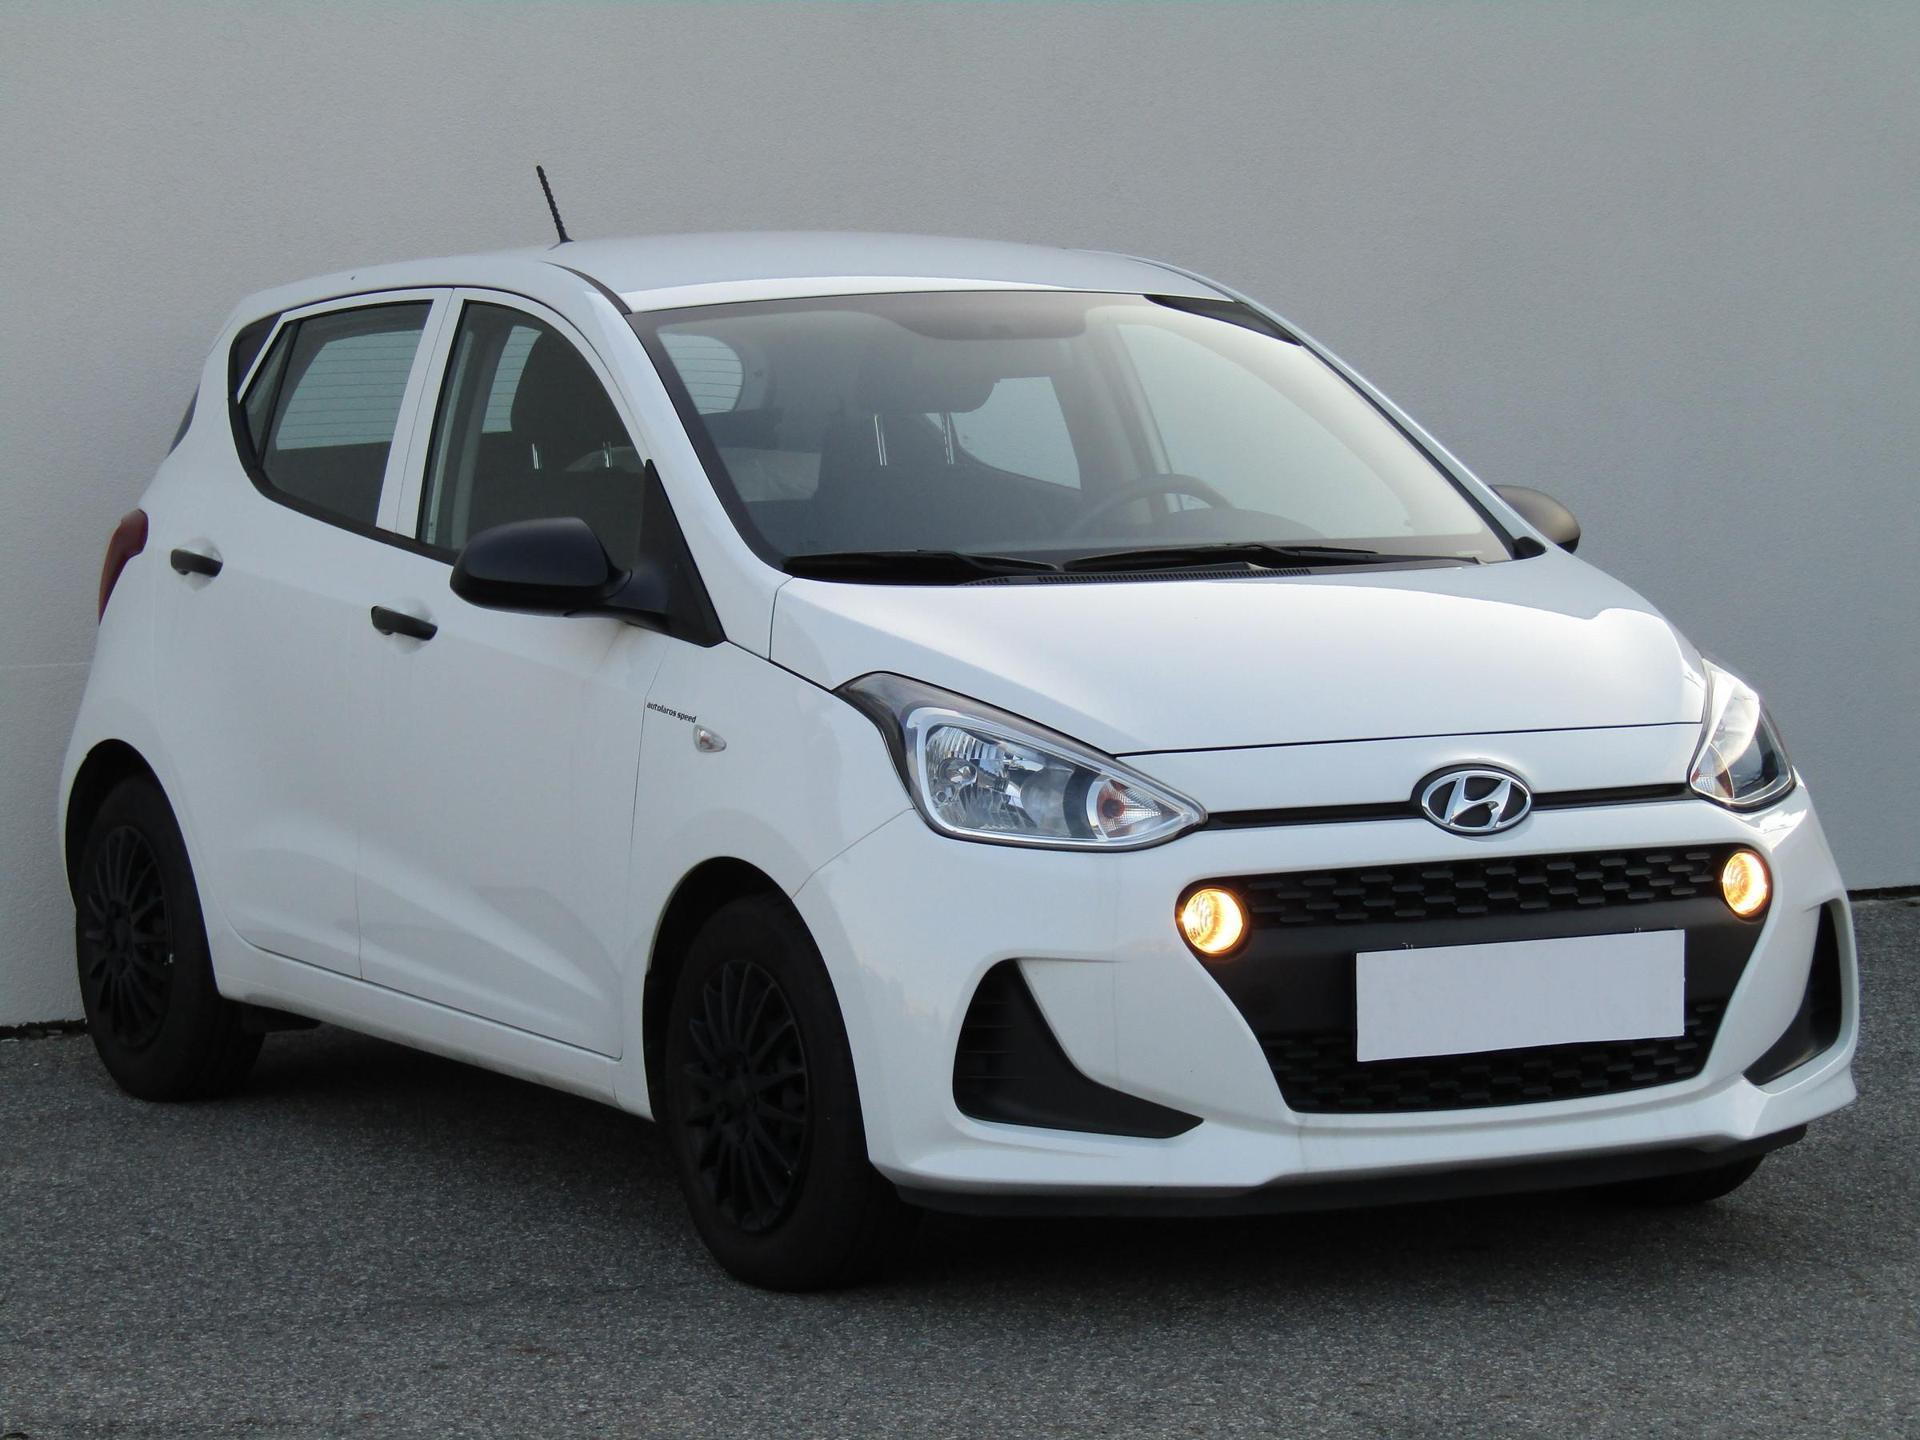 Hyundai i10 1.0i, ČR hatchback benzin